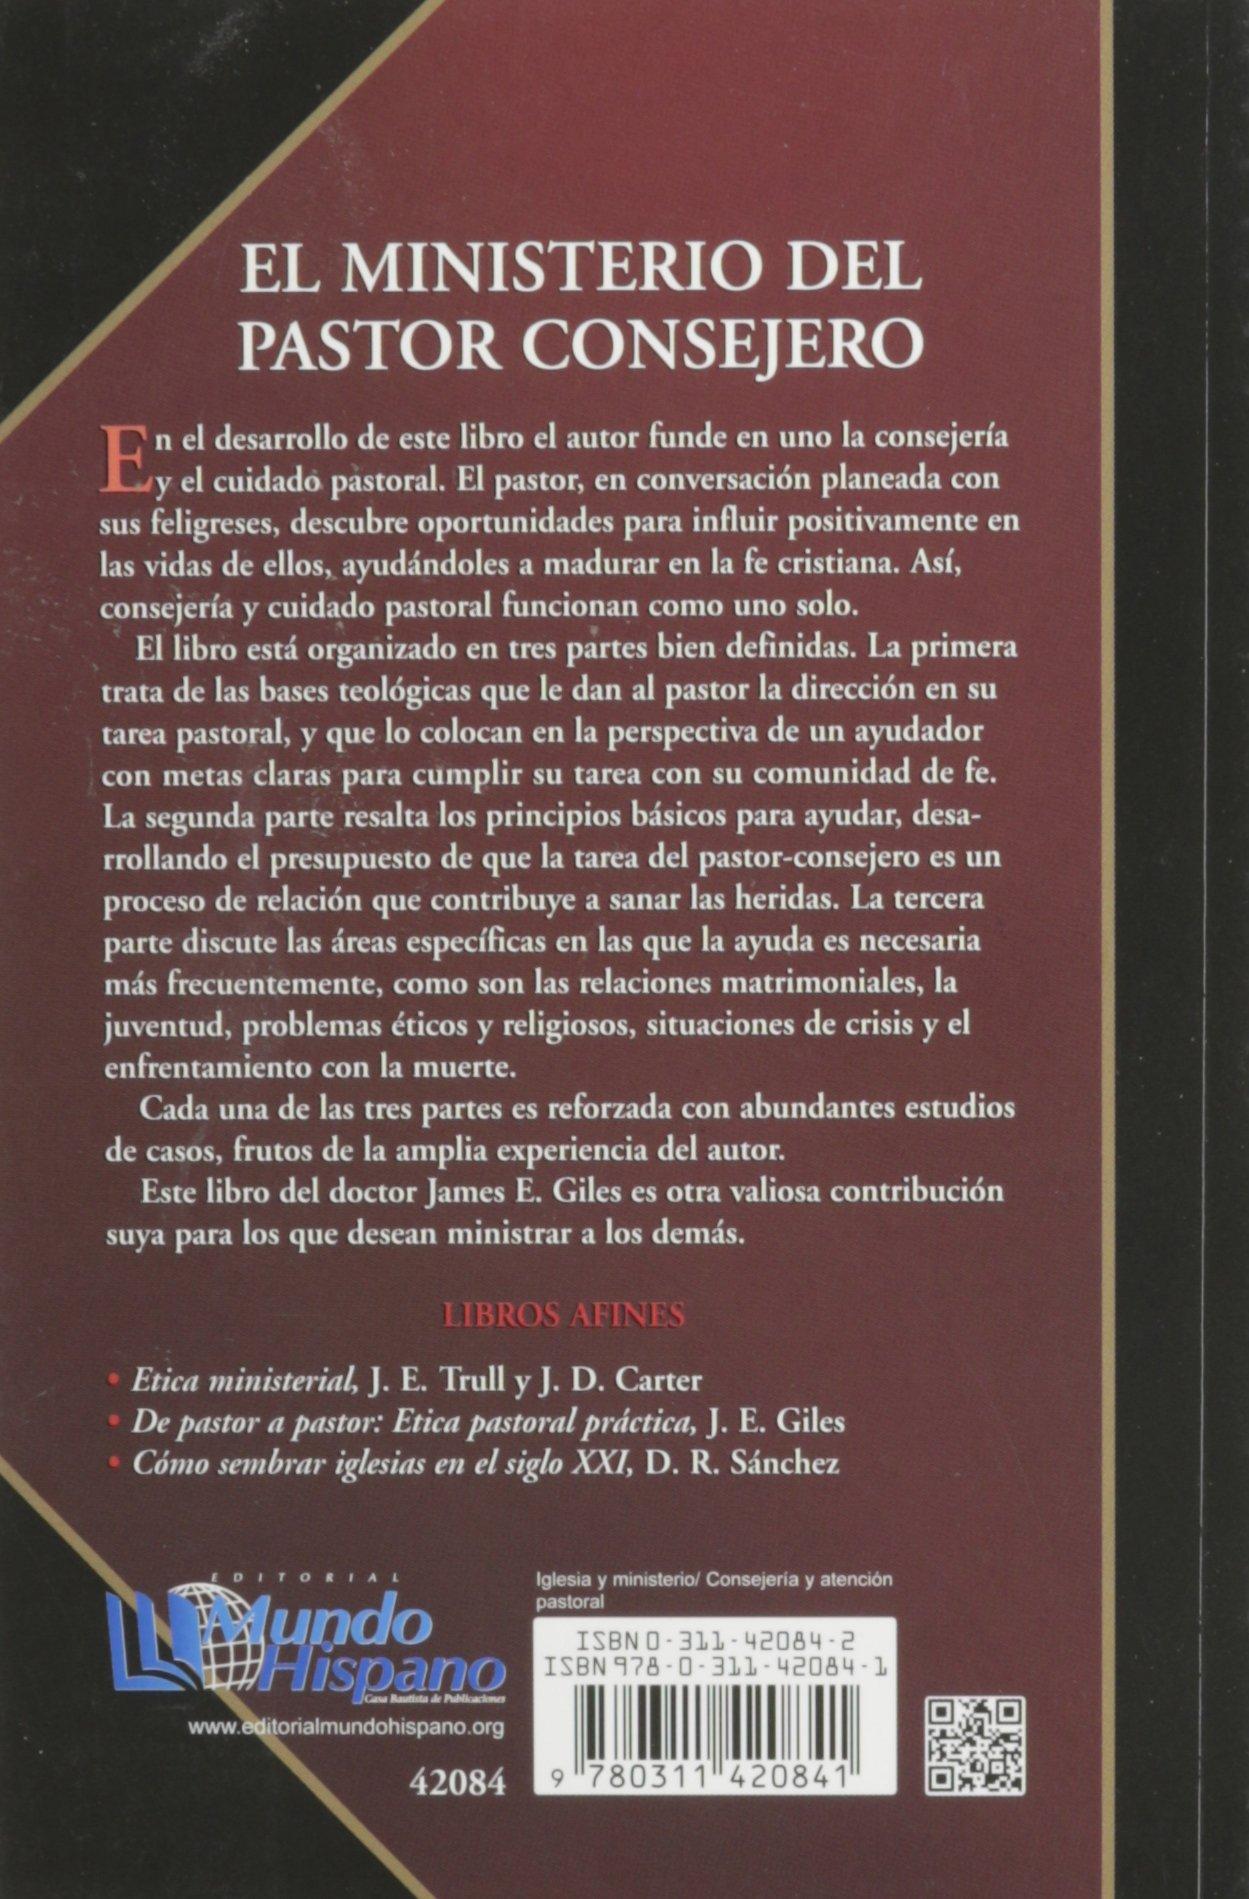 El ministerio del pastor consejero spanish edition james e giles el ministerio del pastor consejero spanish edition james e giles 9780311420841 amazon books fandeluxe Gallery